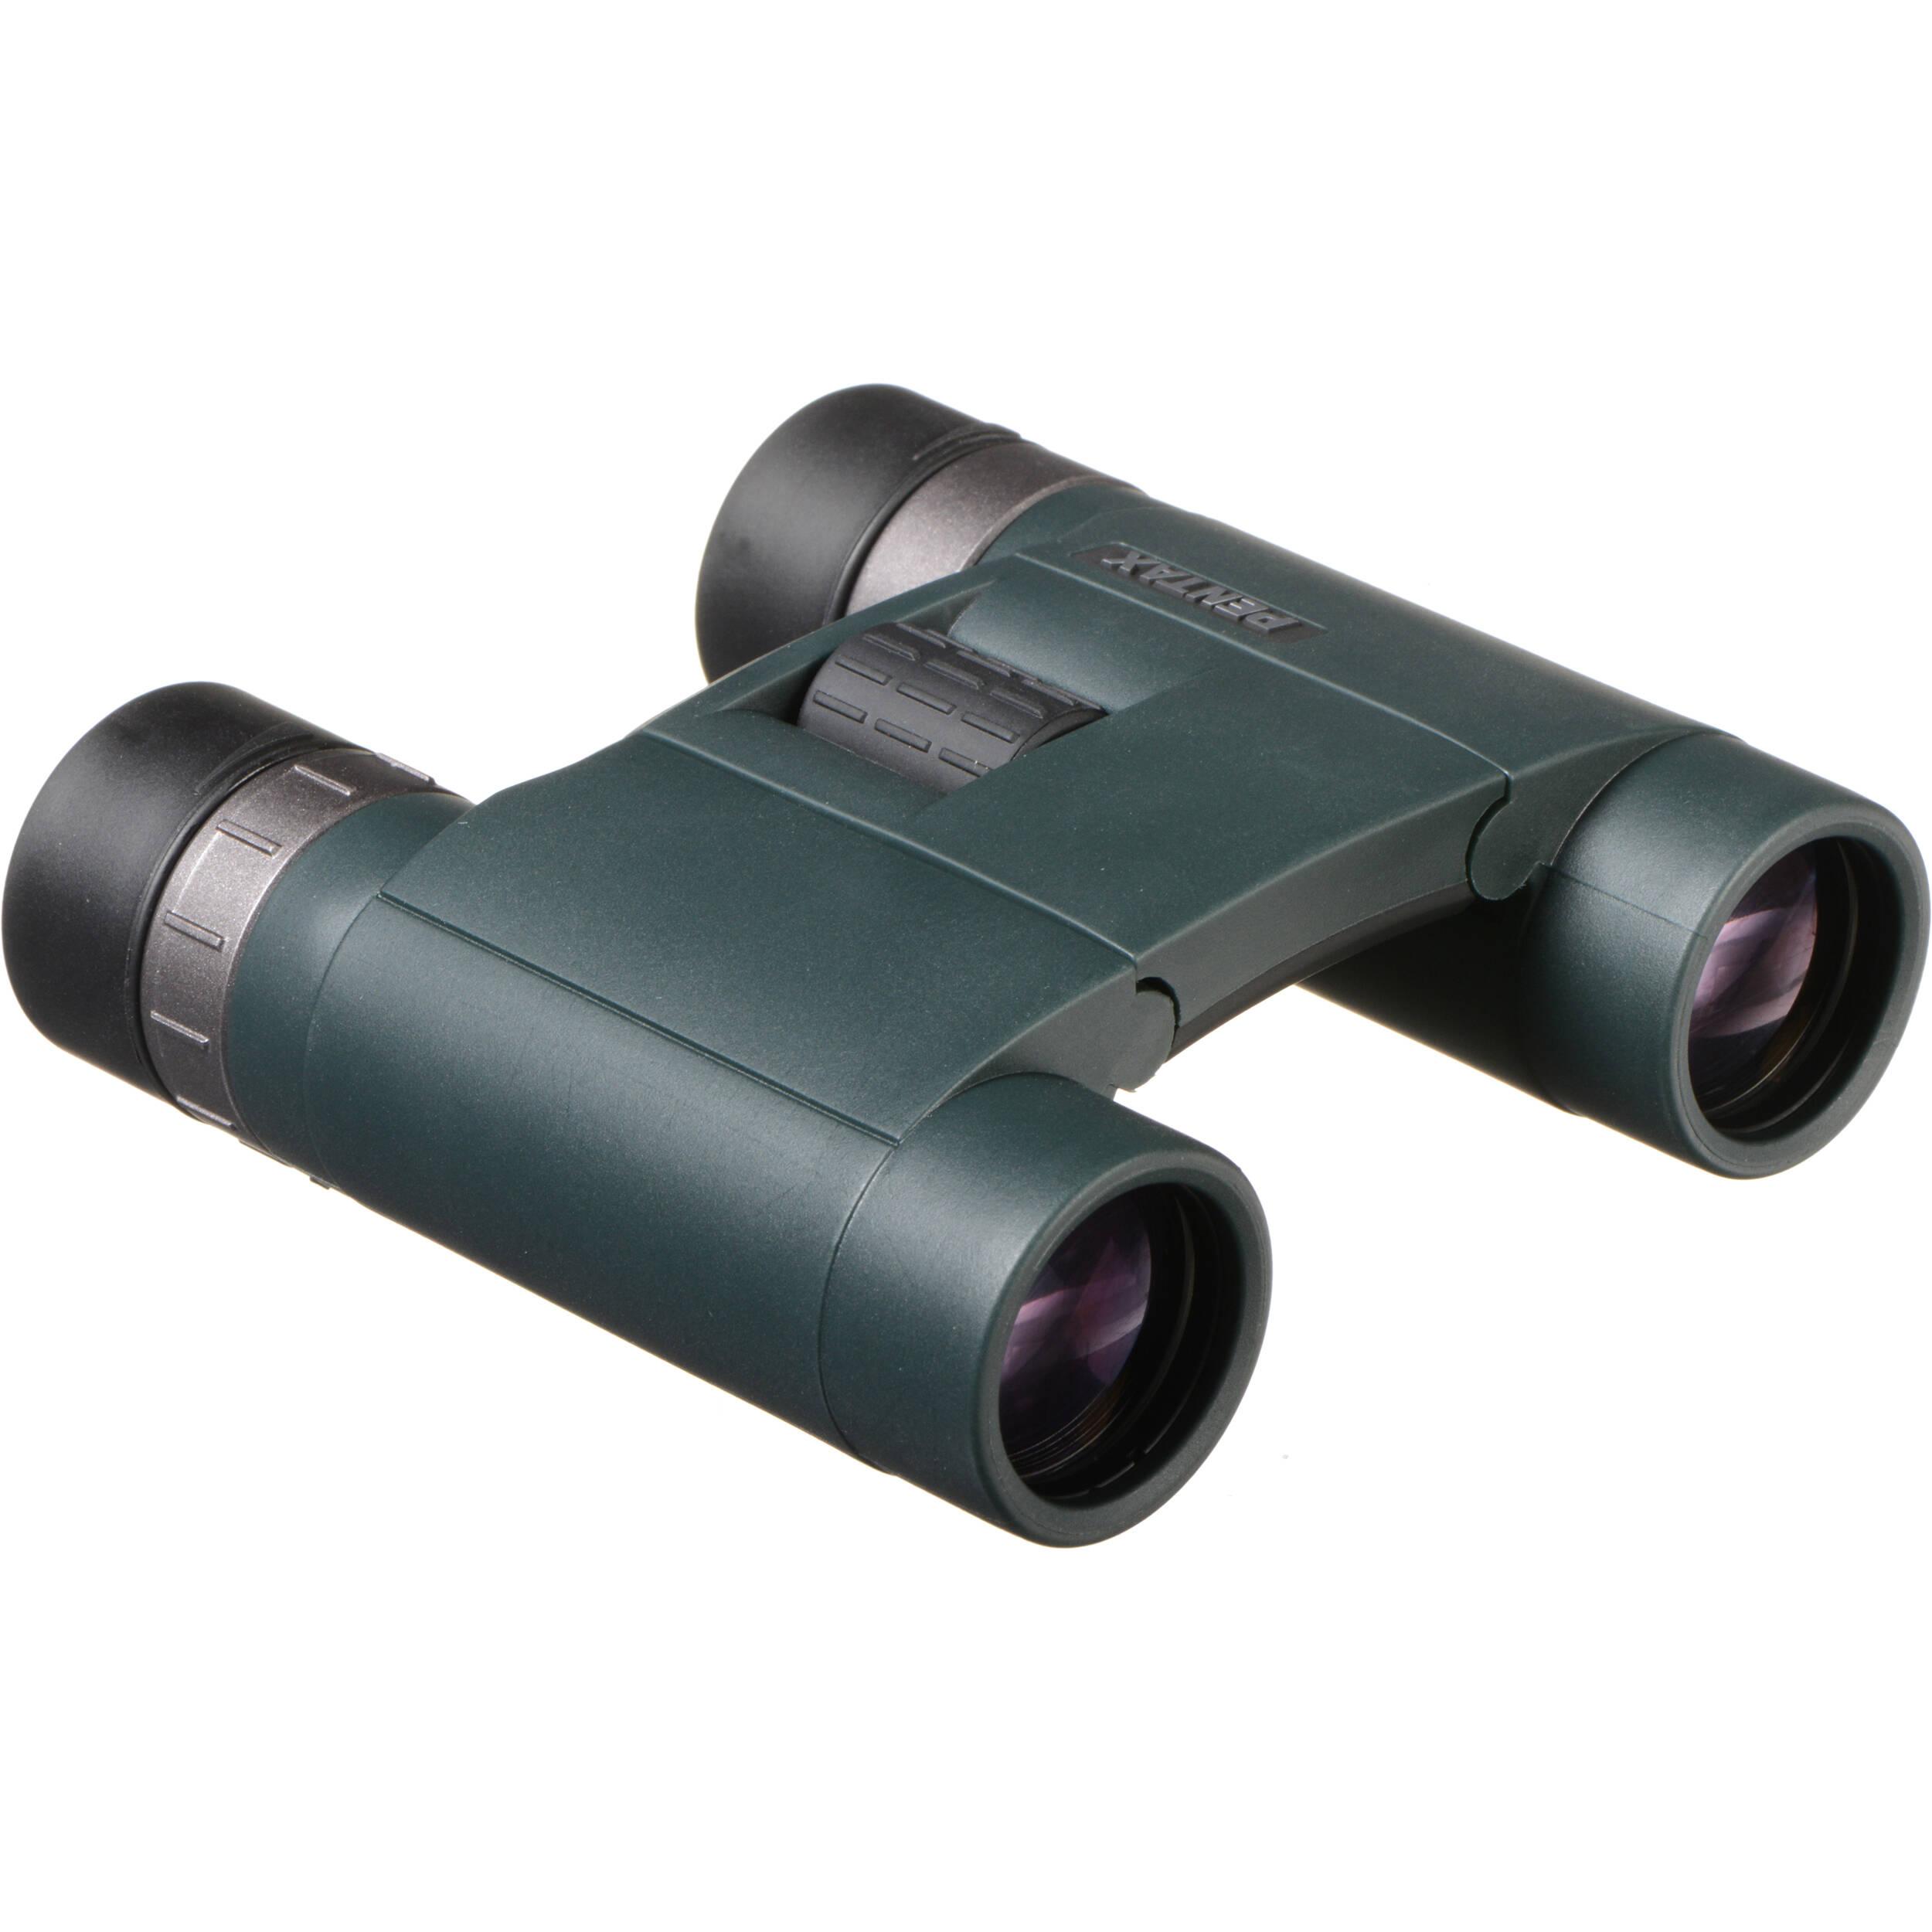 pentax 10x25 a series ad wp compact binocular 62882 b h photo rh bhphotovideo com Pentax Eyepiece Magnification Chart Pentax Eyepiece Magnification Chart